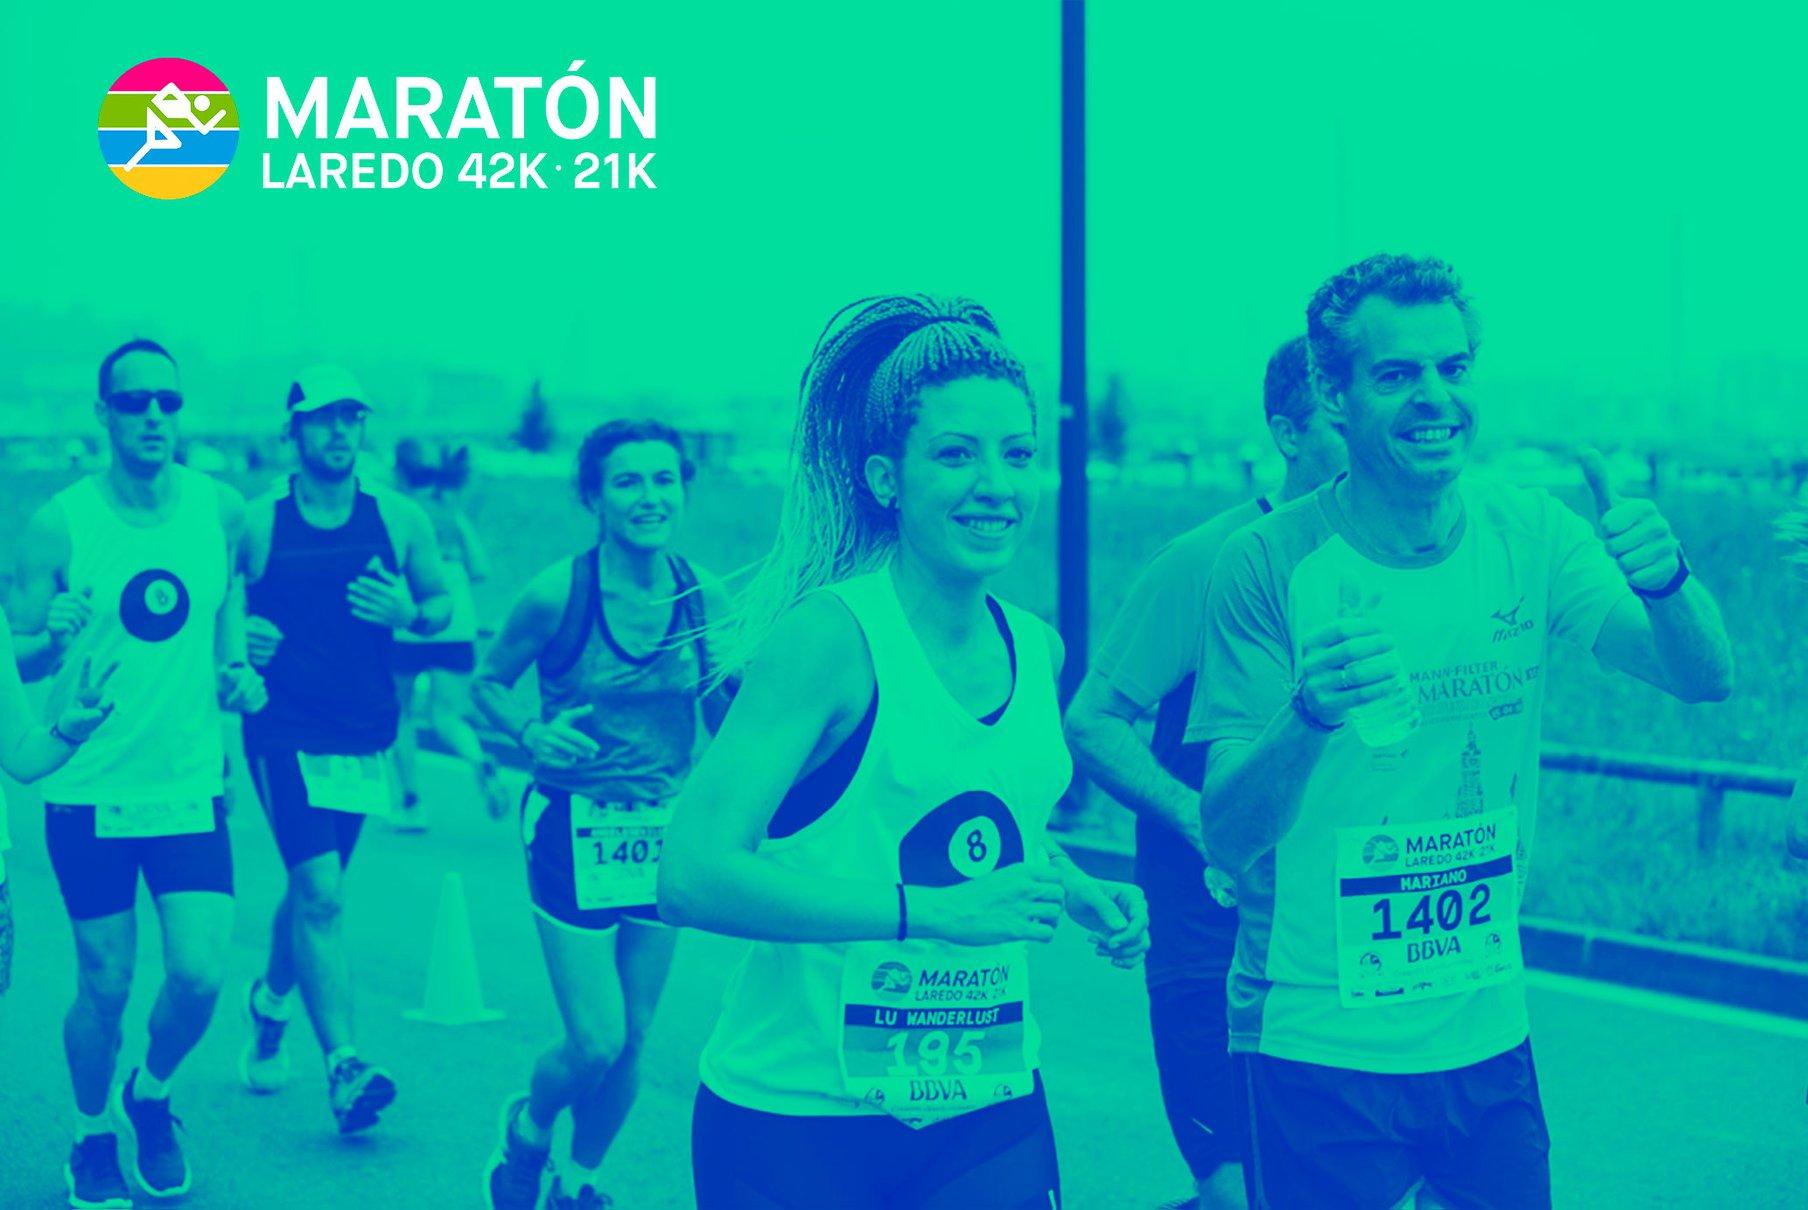 maraton laredo 2019 promo